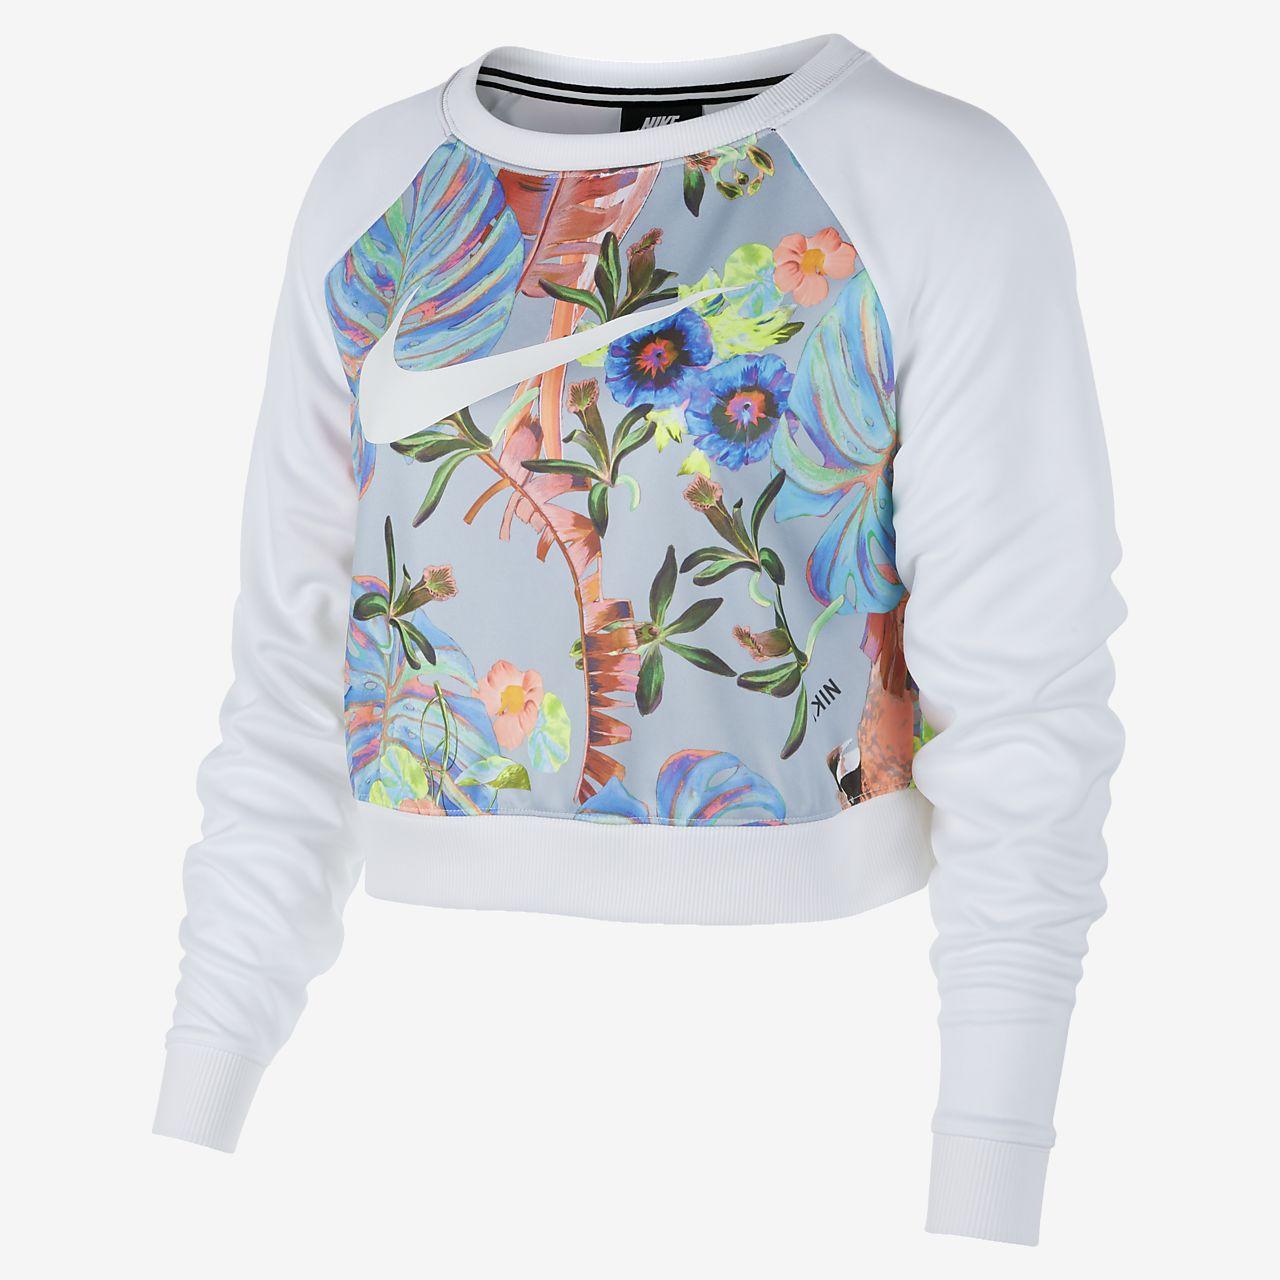 Nike Sportswear Women's Print Crew